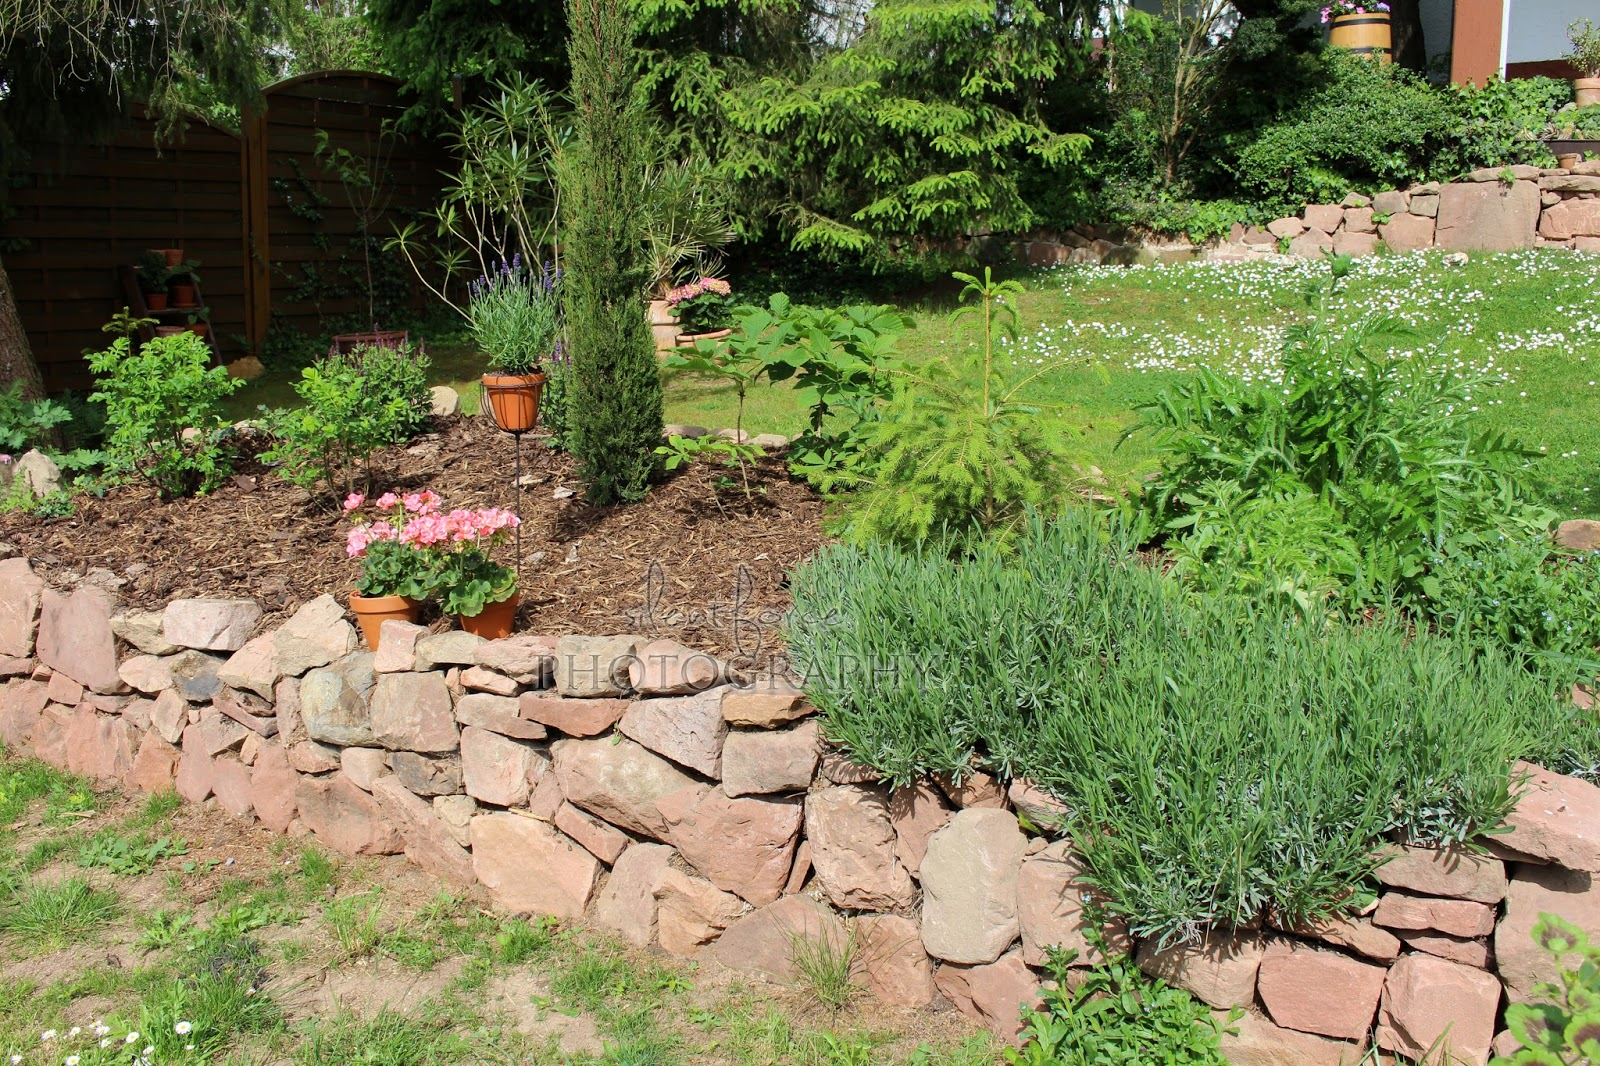 mediterranes hochbeet silentforce garden. Black Bedroom Furniture Sets. Home Design Ideas